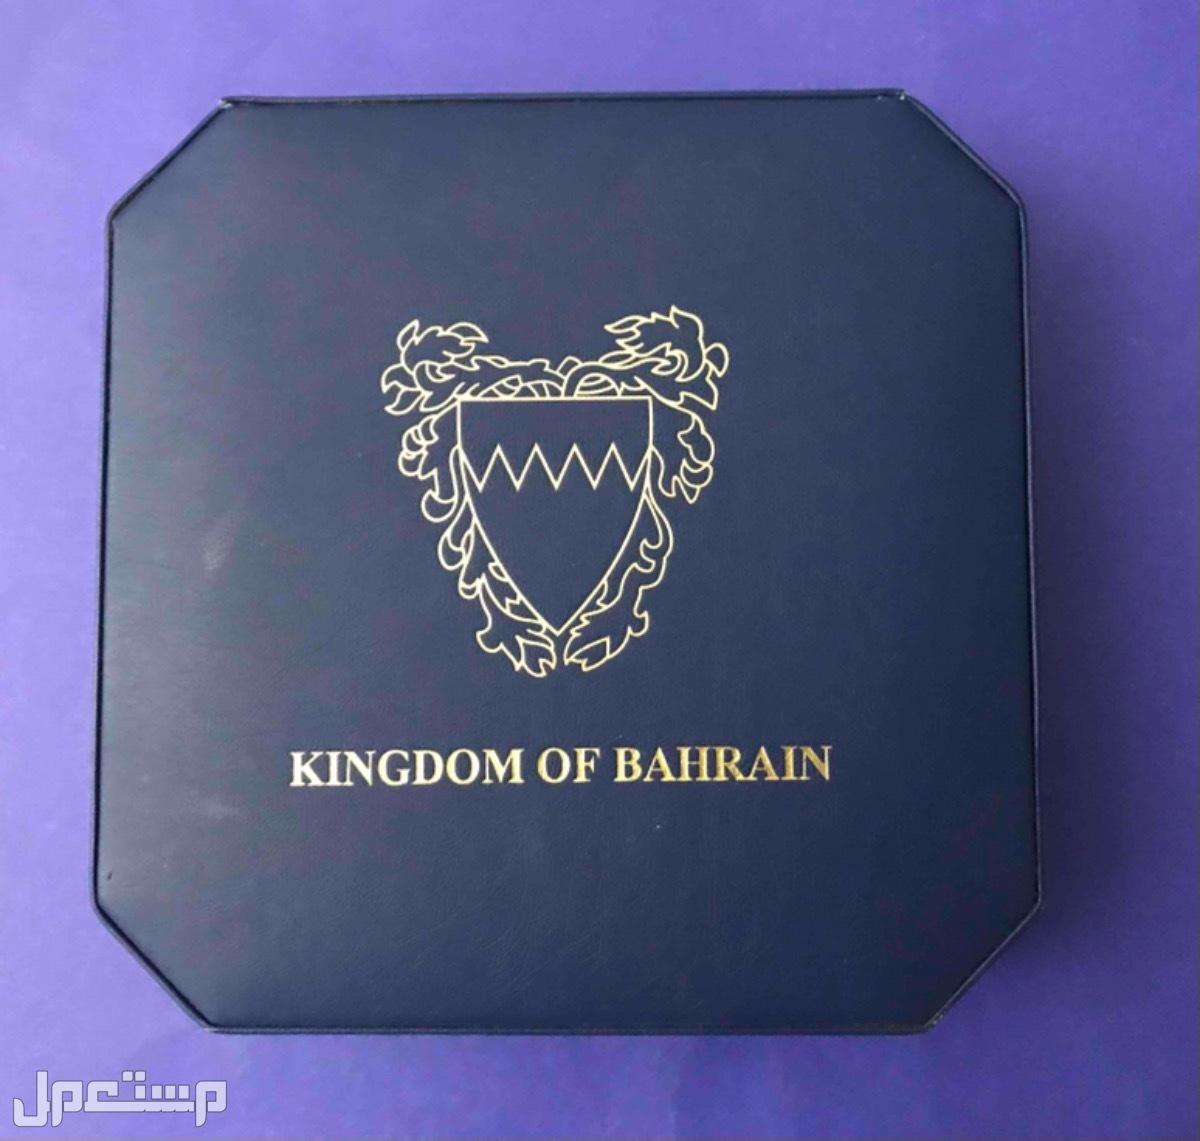 مجموعه تذكارات البحرين بروف فضه